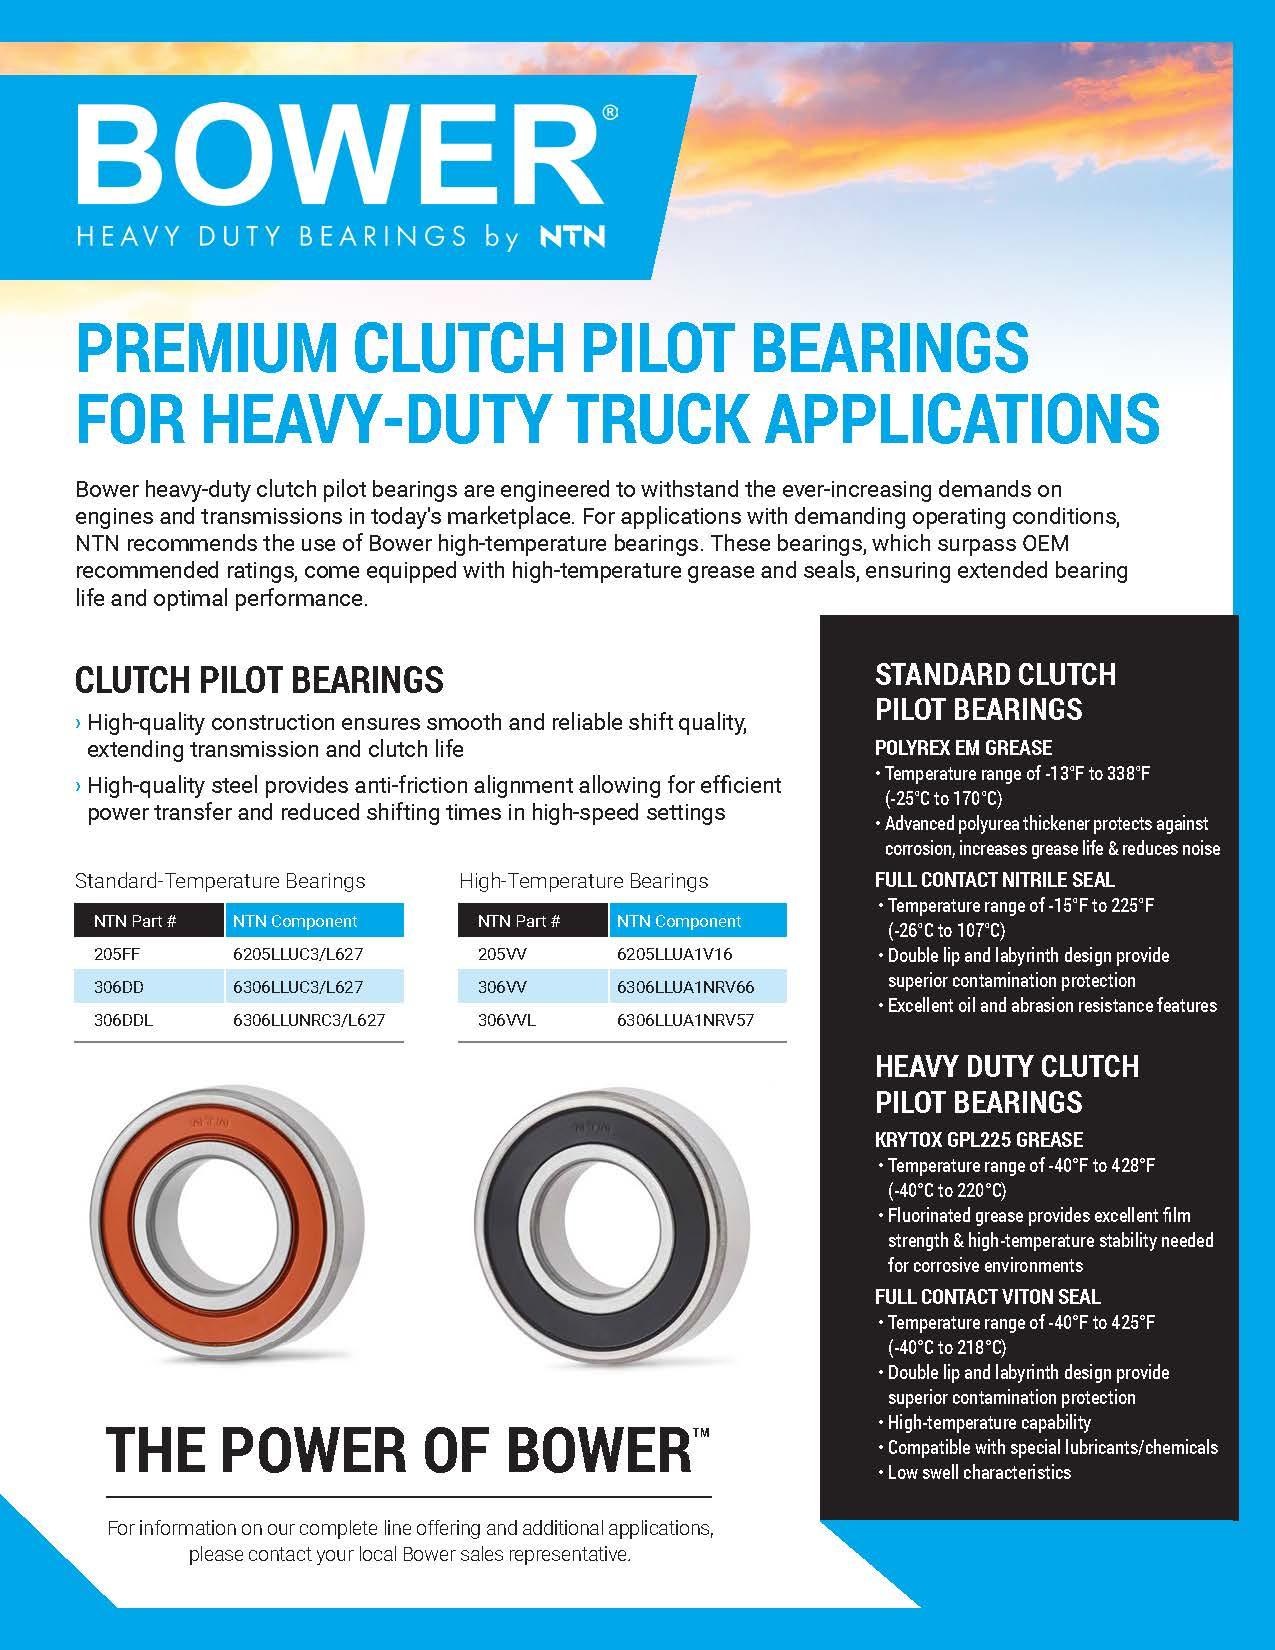 NTN Bower-Clutch Pilot Bearings